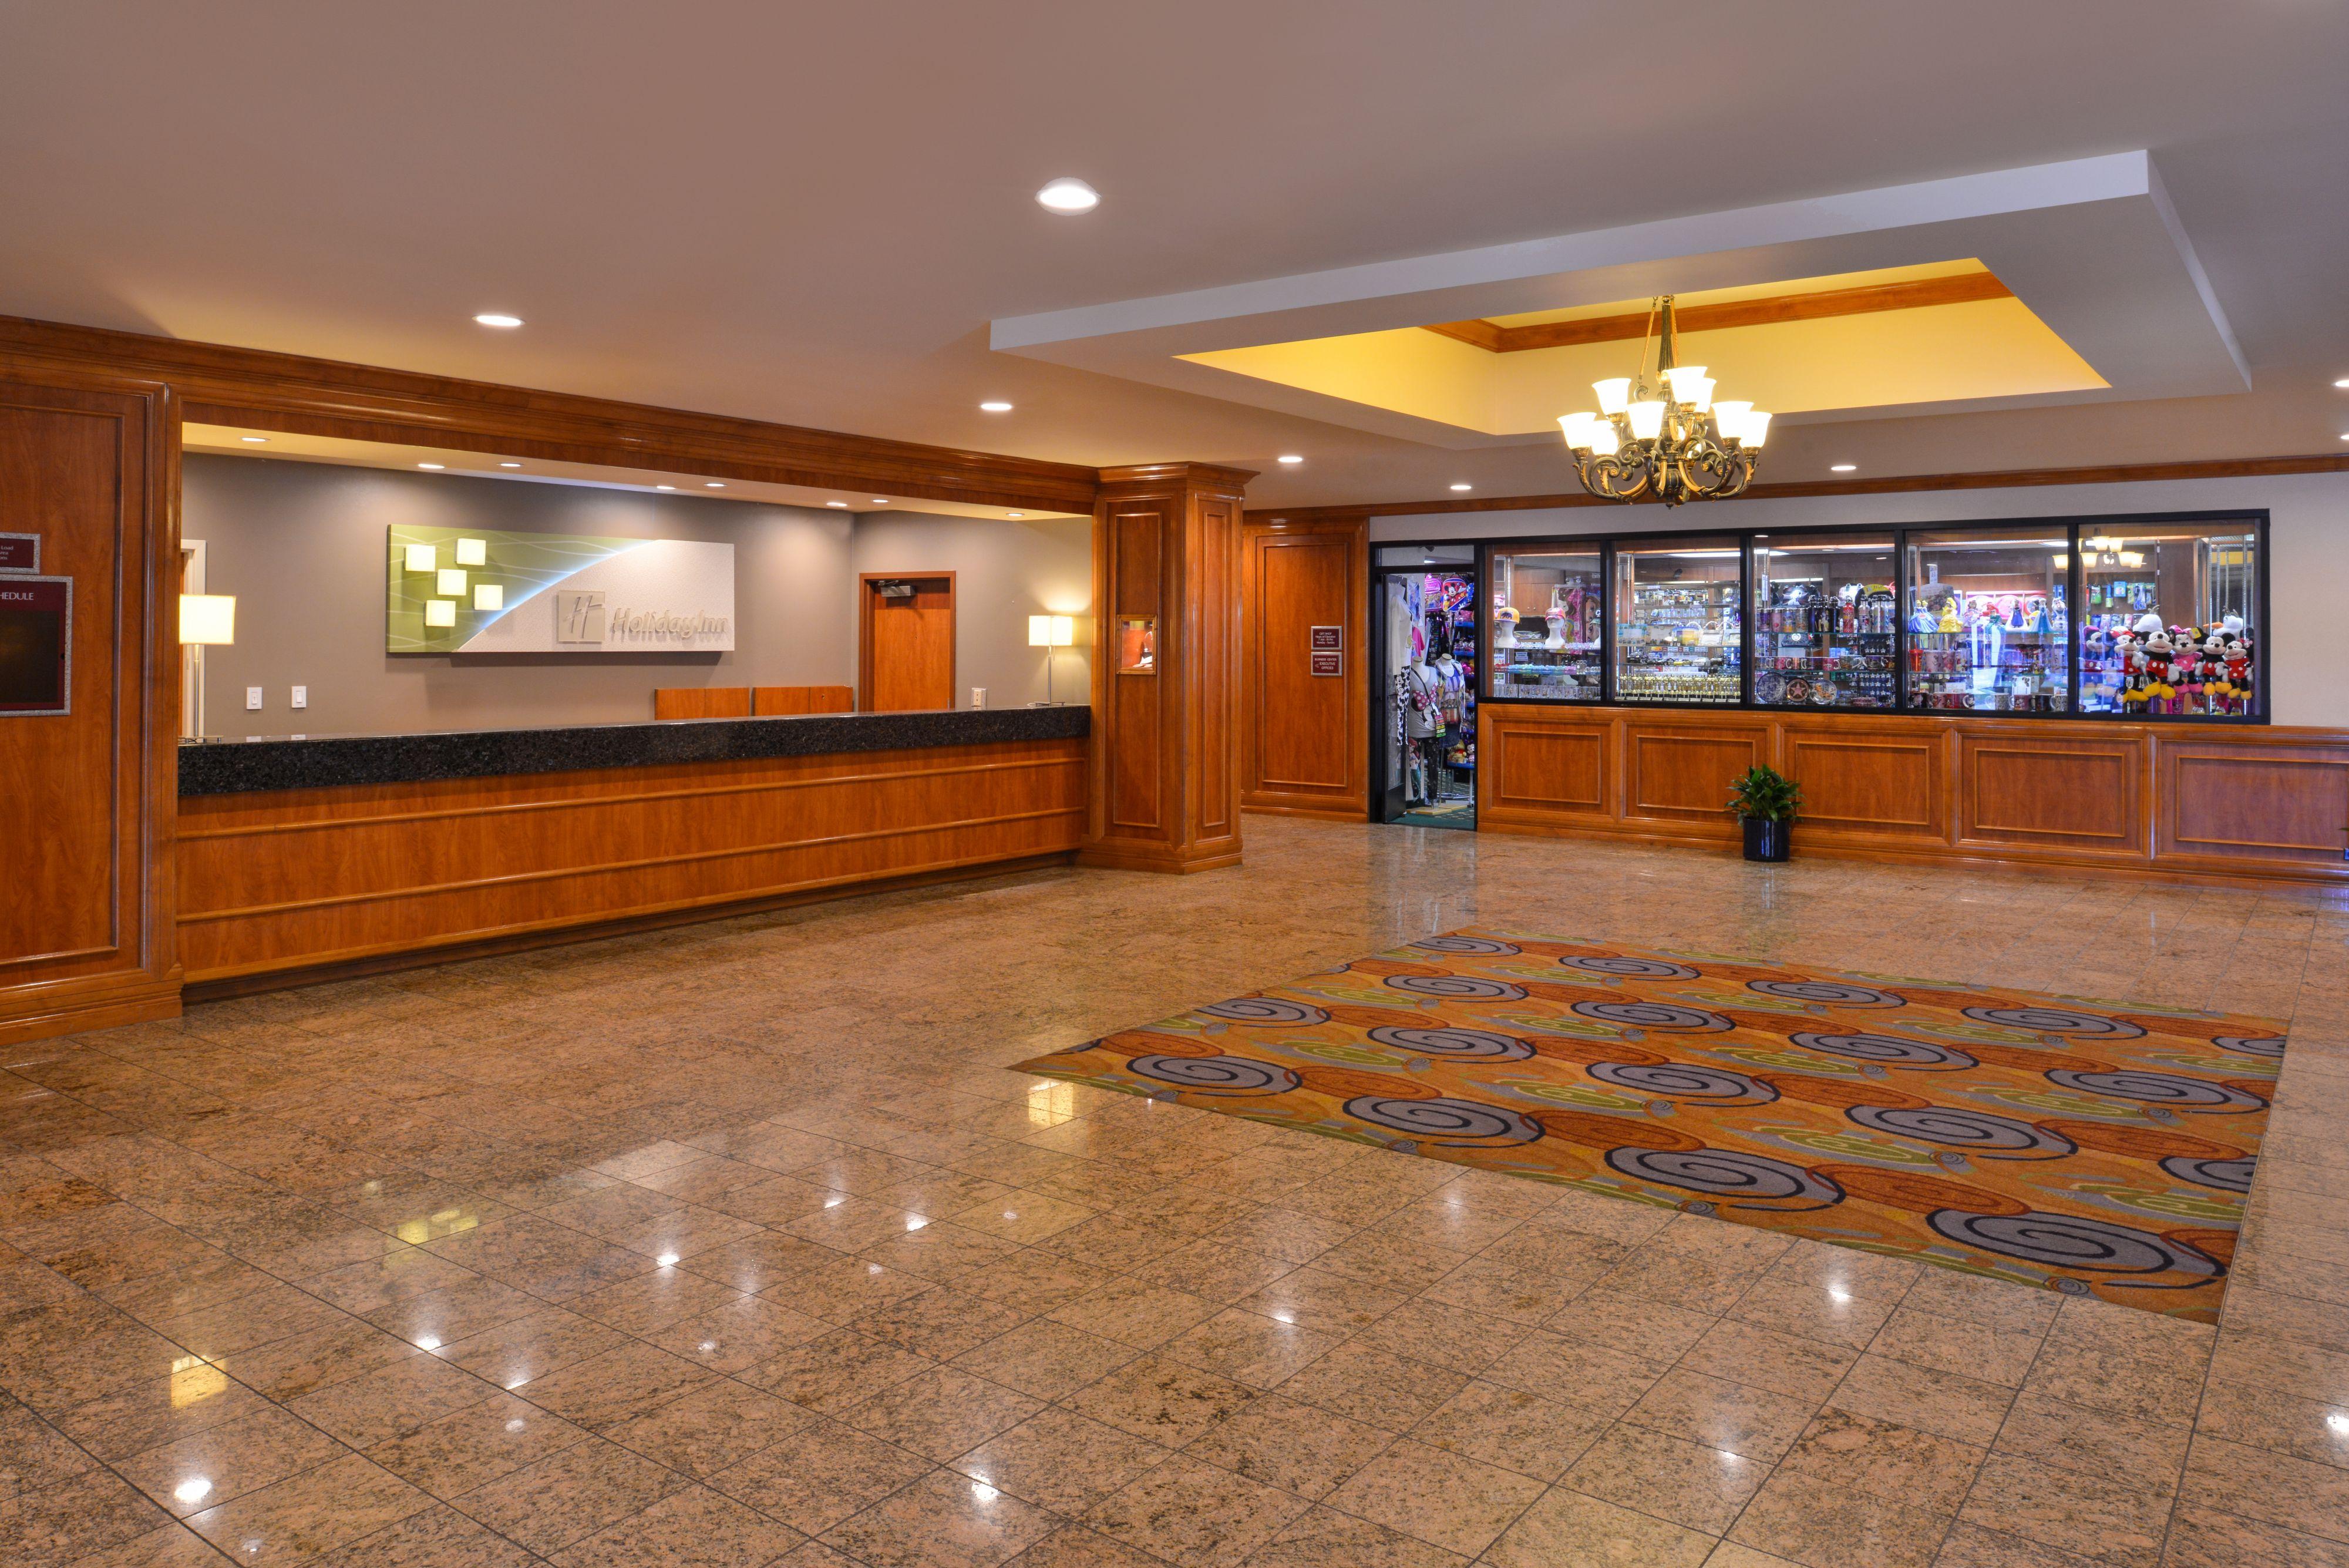 La Mirada Restaurant Group Inc